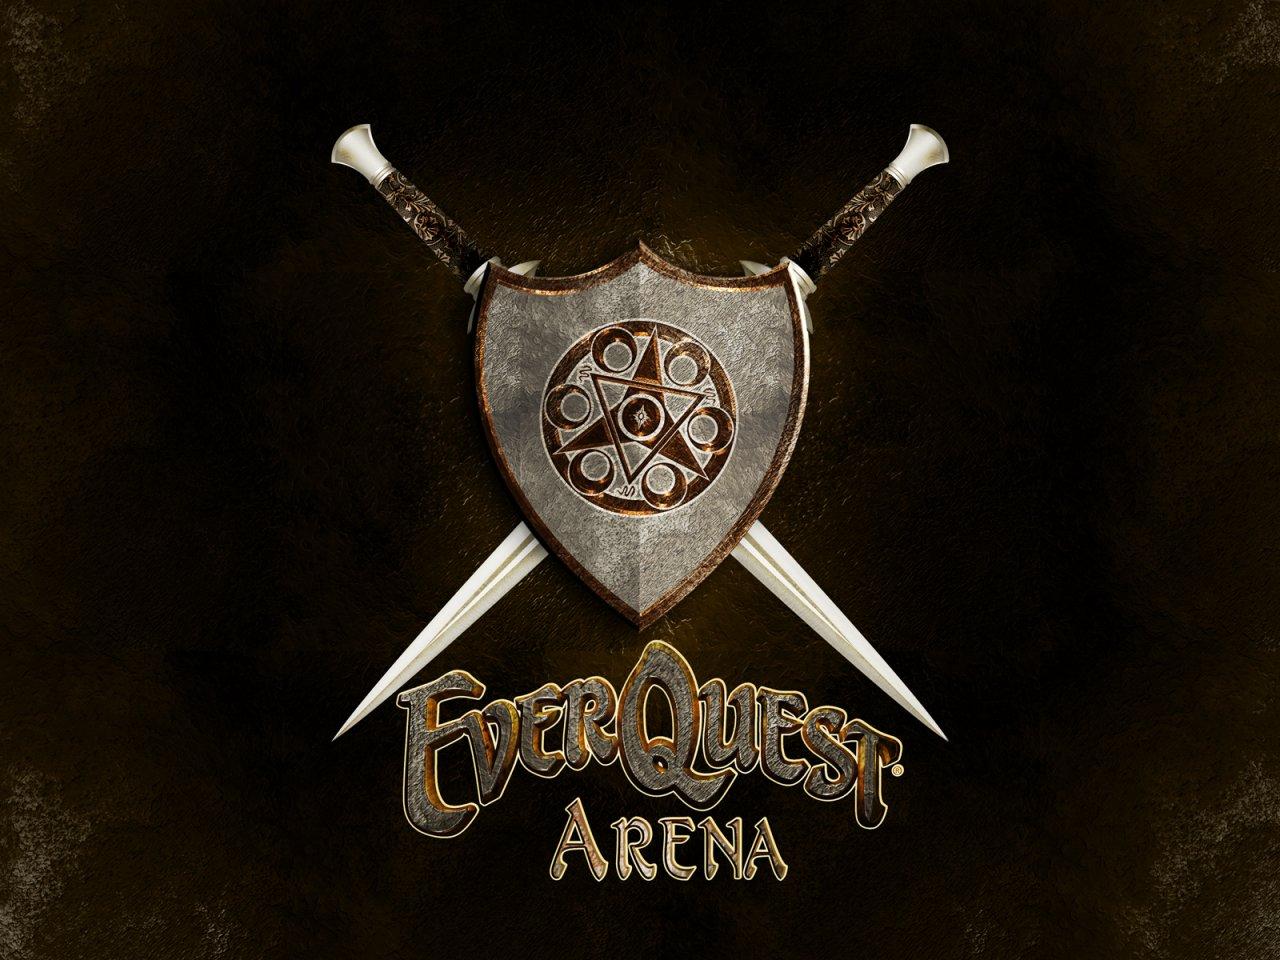 eqarena_logo.jpg